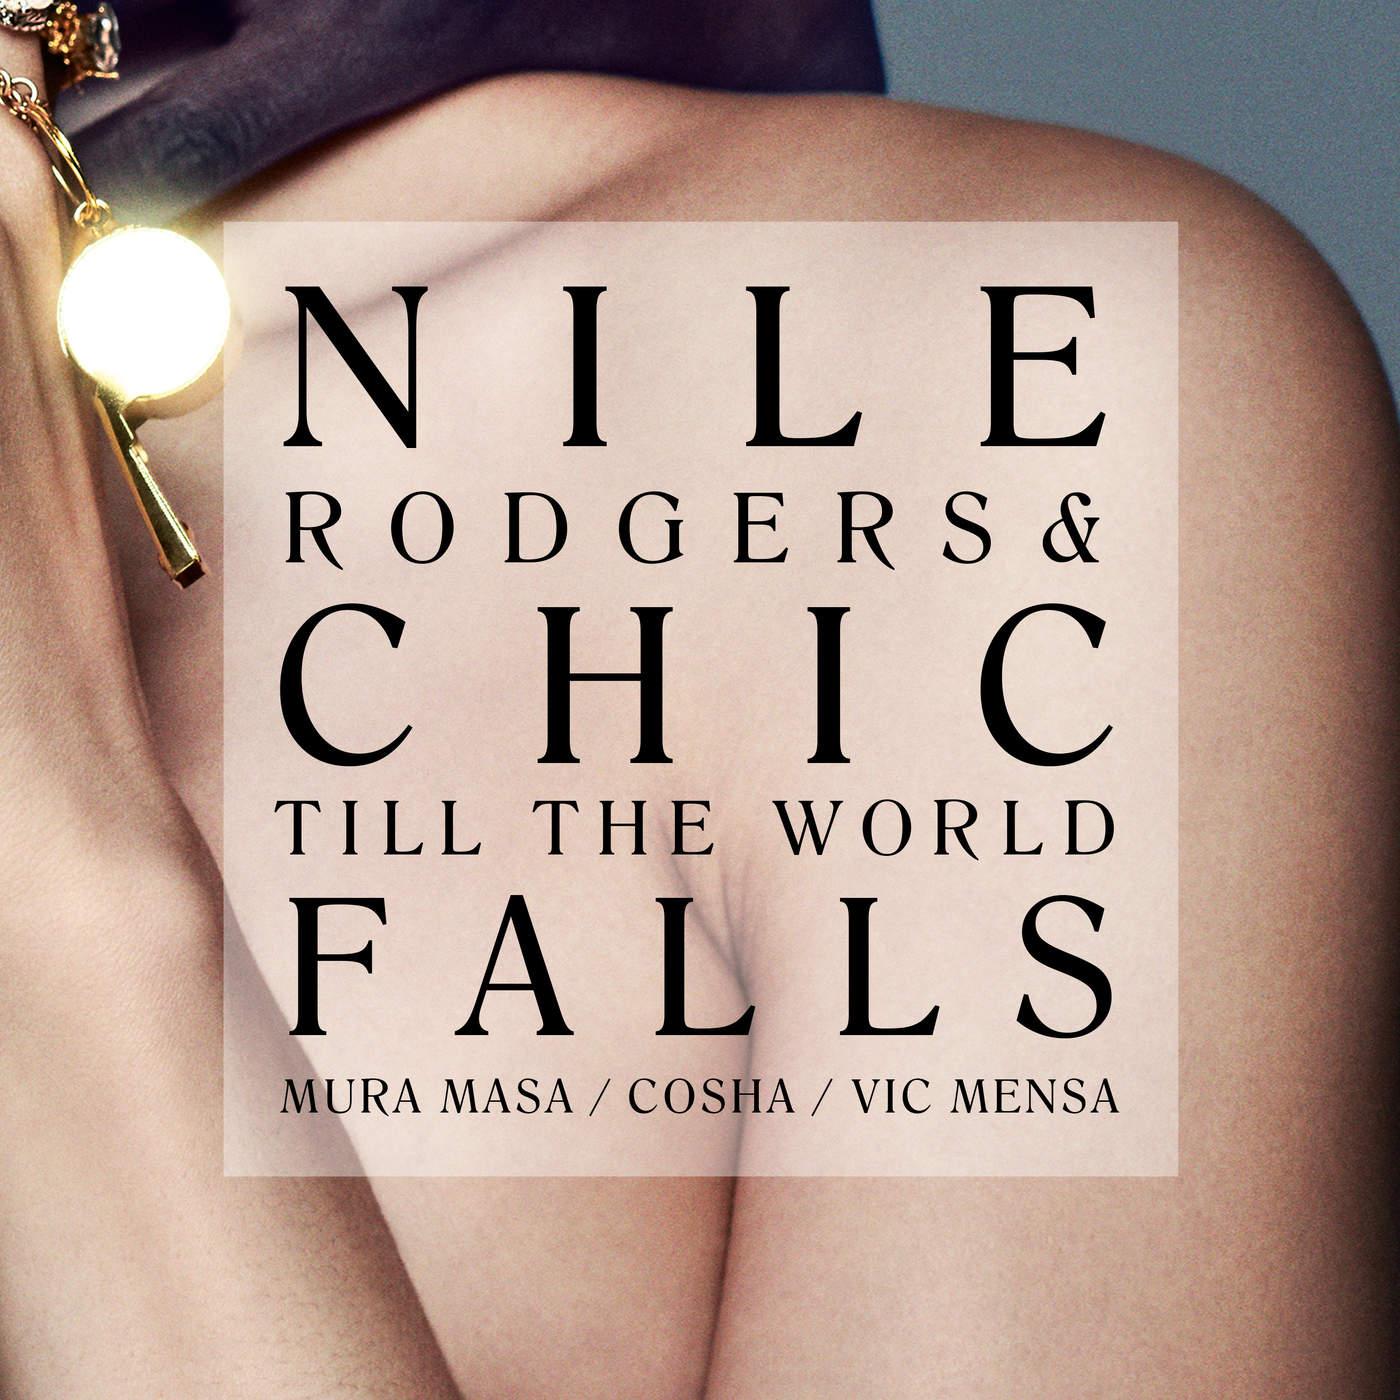 Nile Rodgers, Chic & Mura Masa – Till the World Falls (feat. Cosha & Vic Mensa) – Single [iTunes Plus M4A] | iplusall.4fullz.com